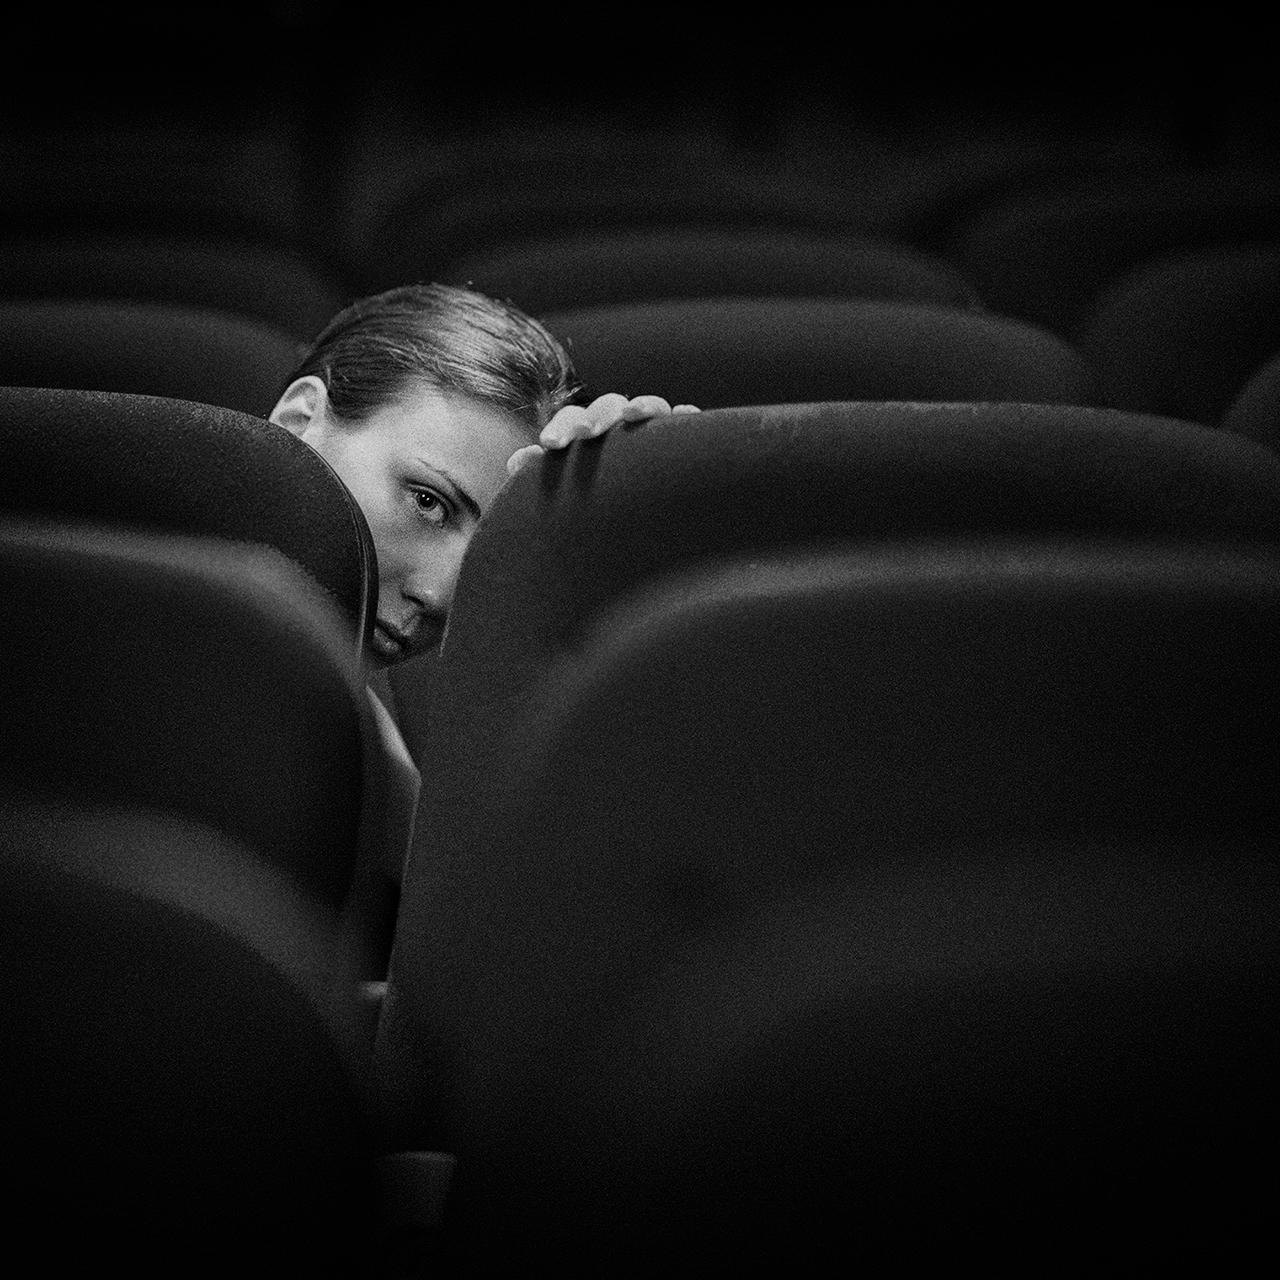 Photo in Portrait | Author demiman | PHOTO FORUM